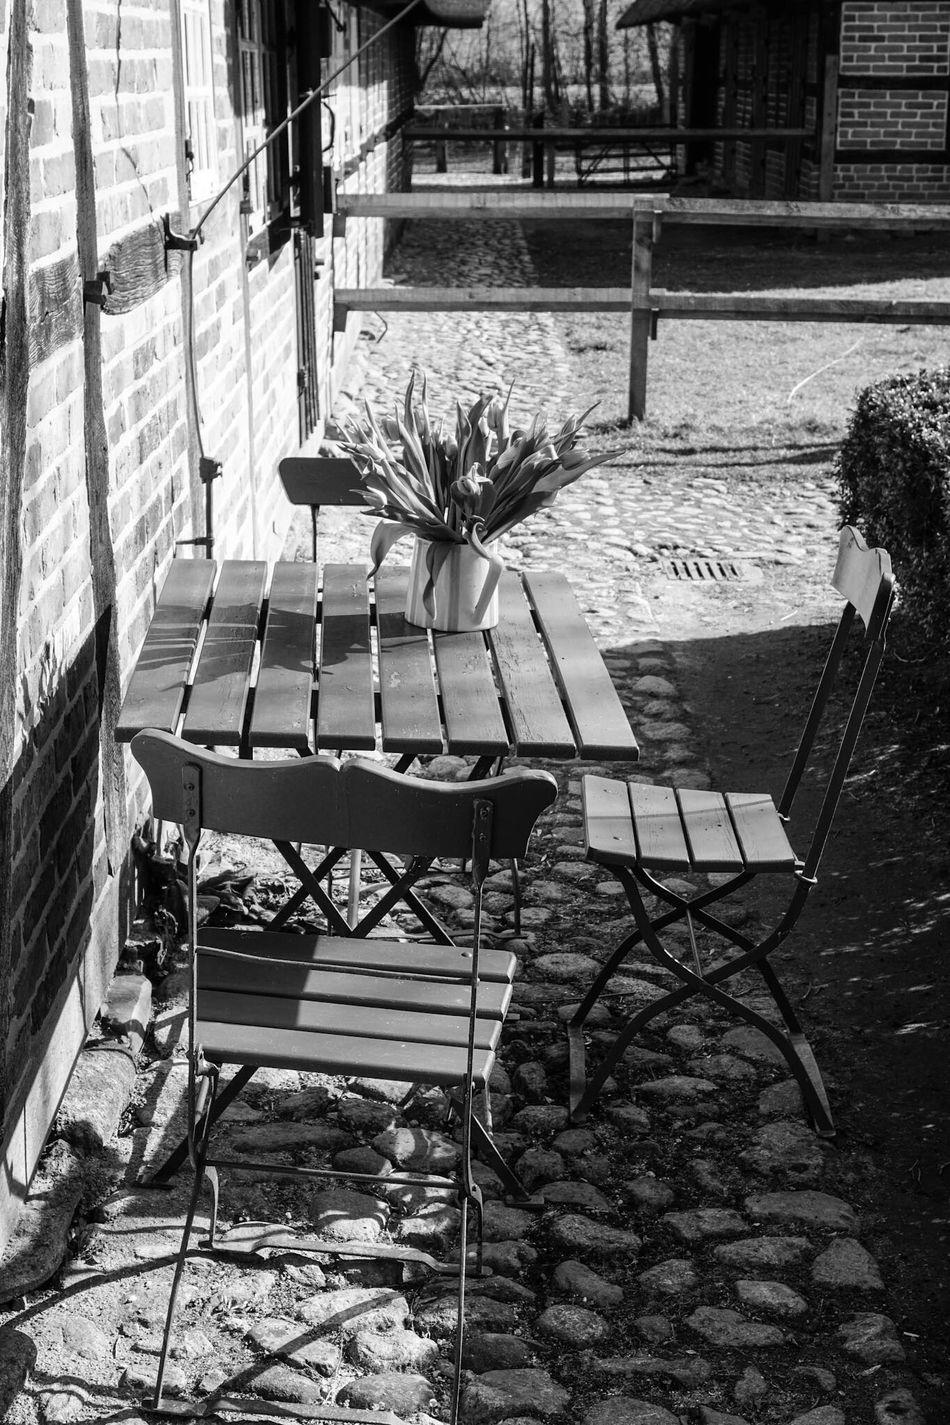 Still Life StillLifePhotography Black & White Black And White Blackandwhite Garden Chairs Table